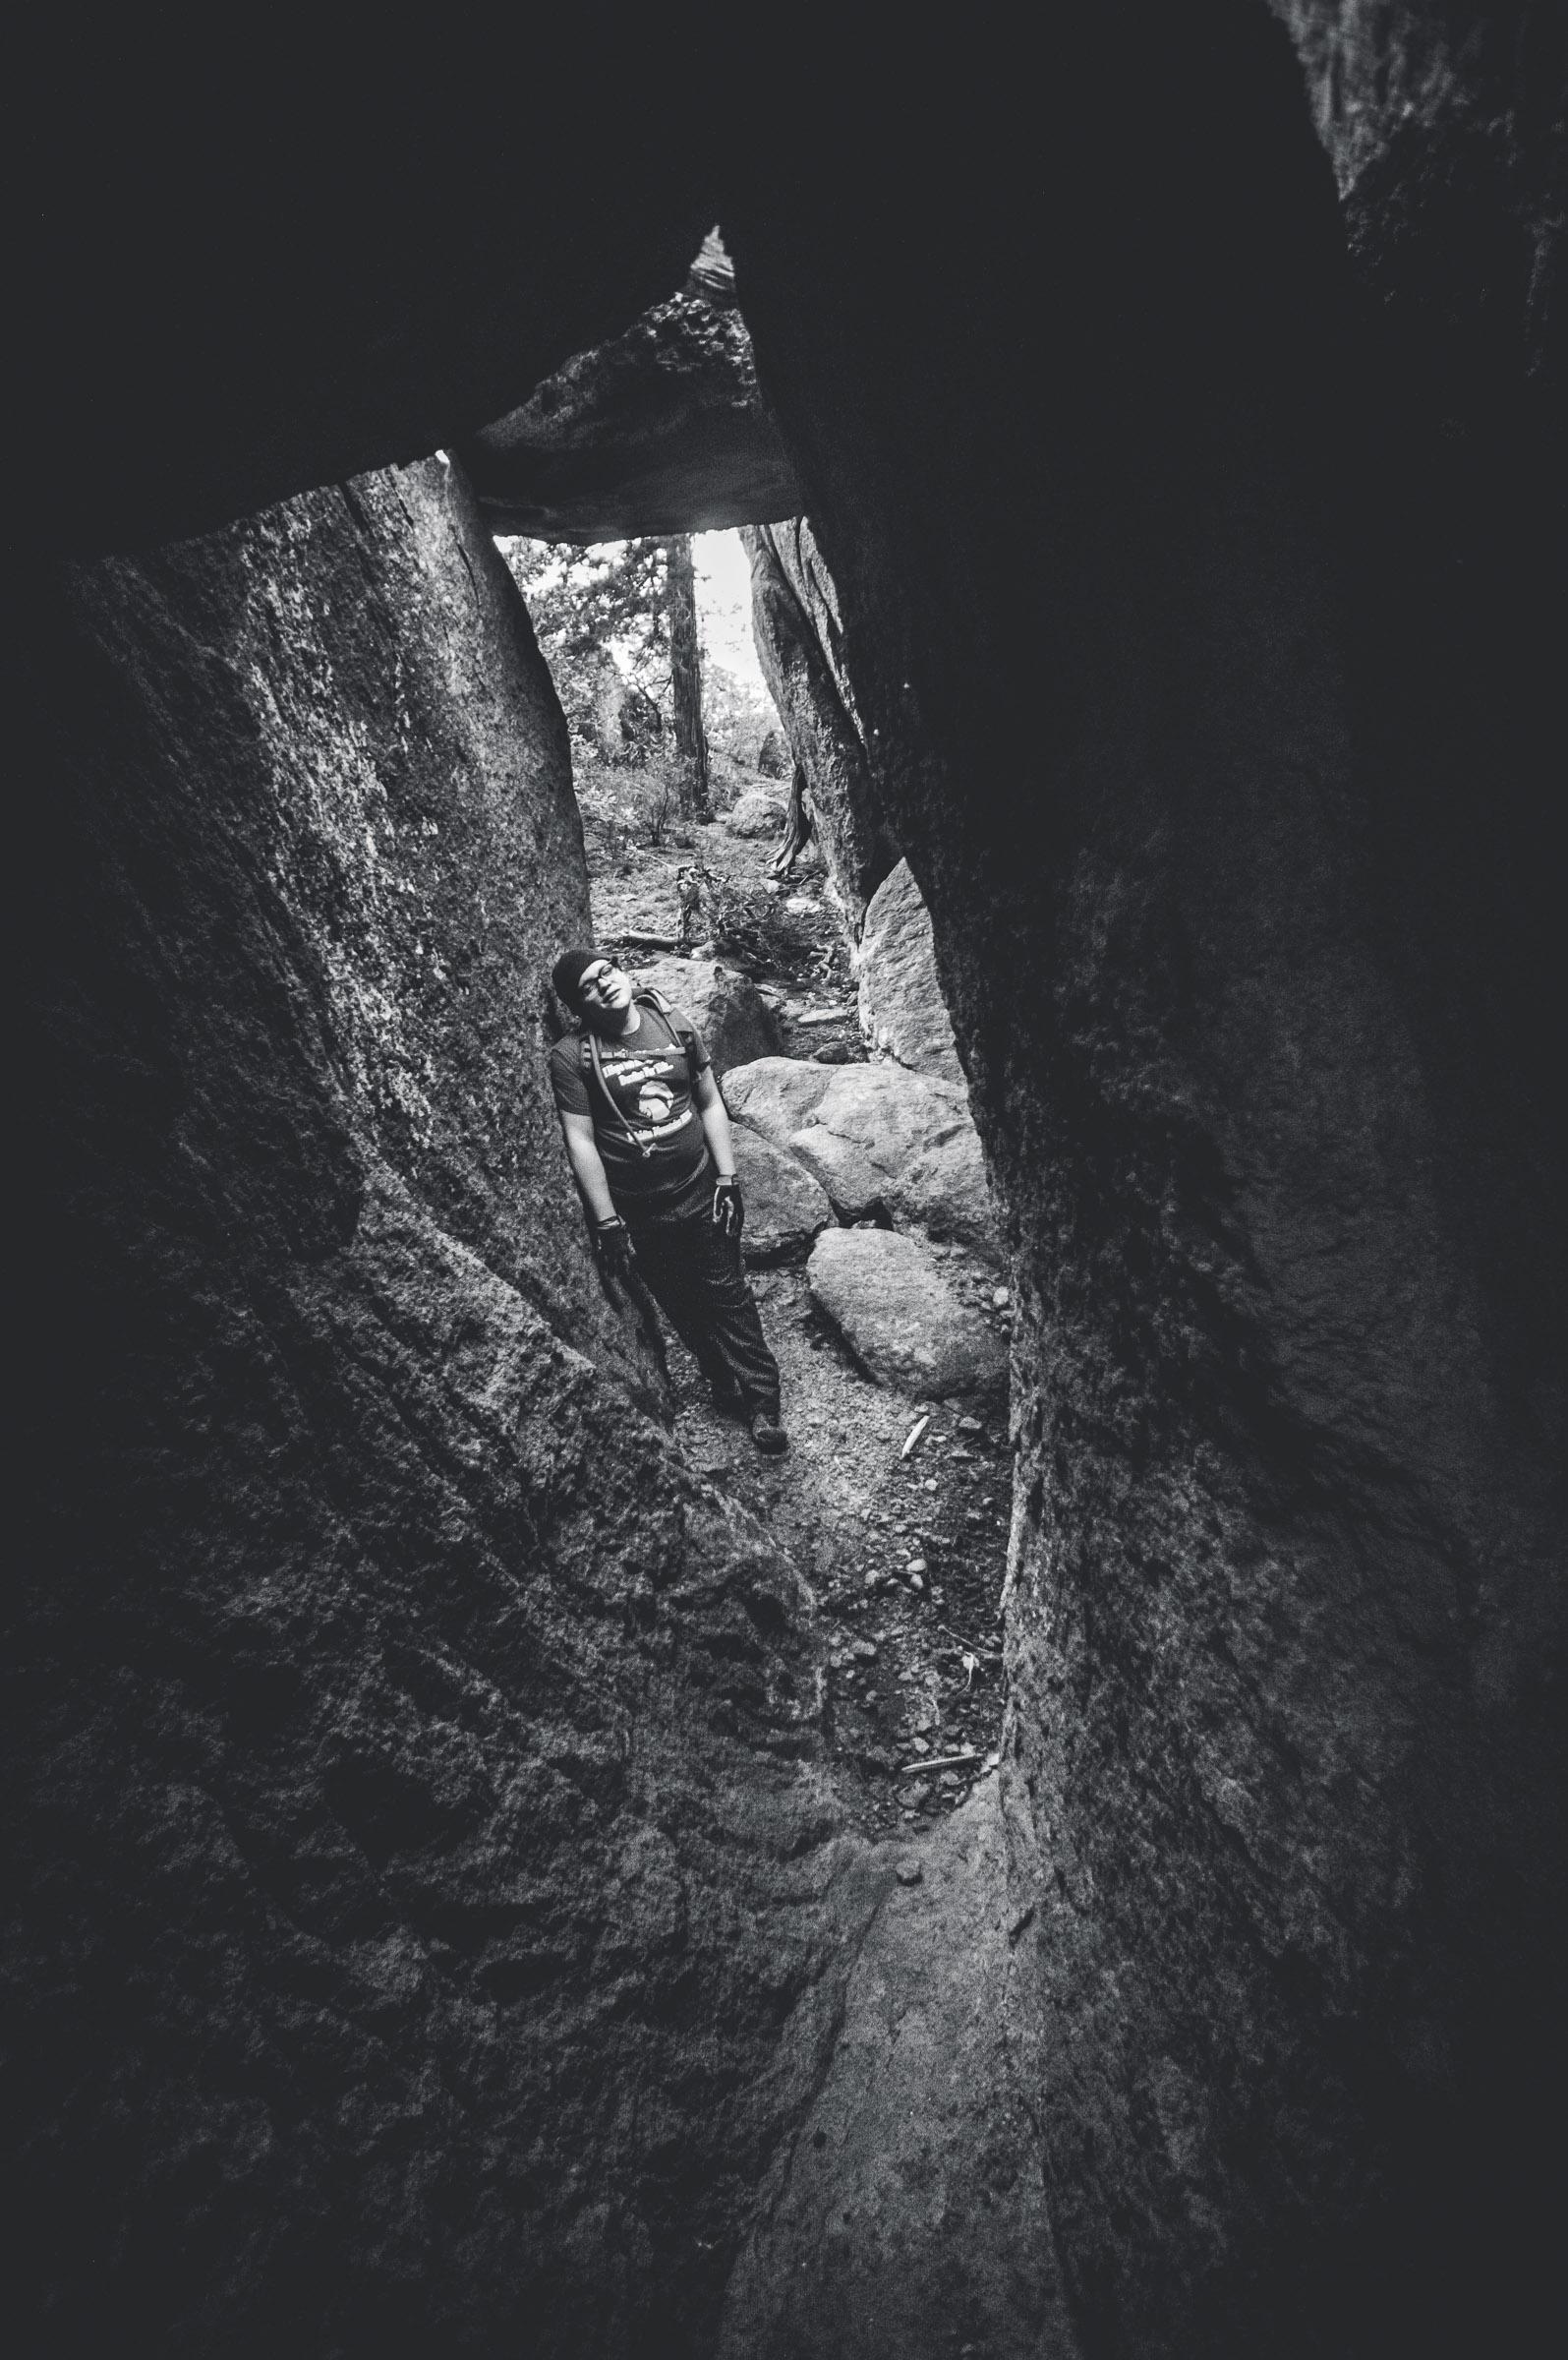 Spanish Cave 11-12-16 B&W (11 of 33).JPG